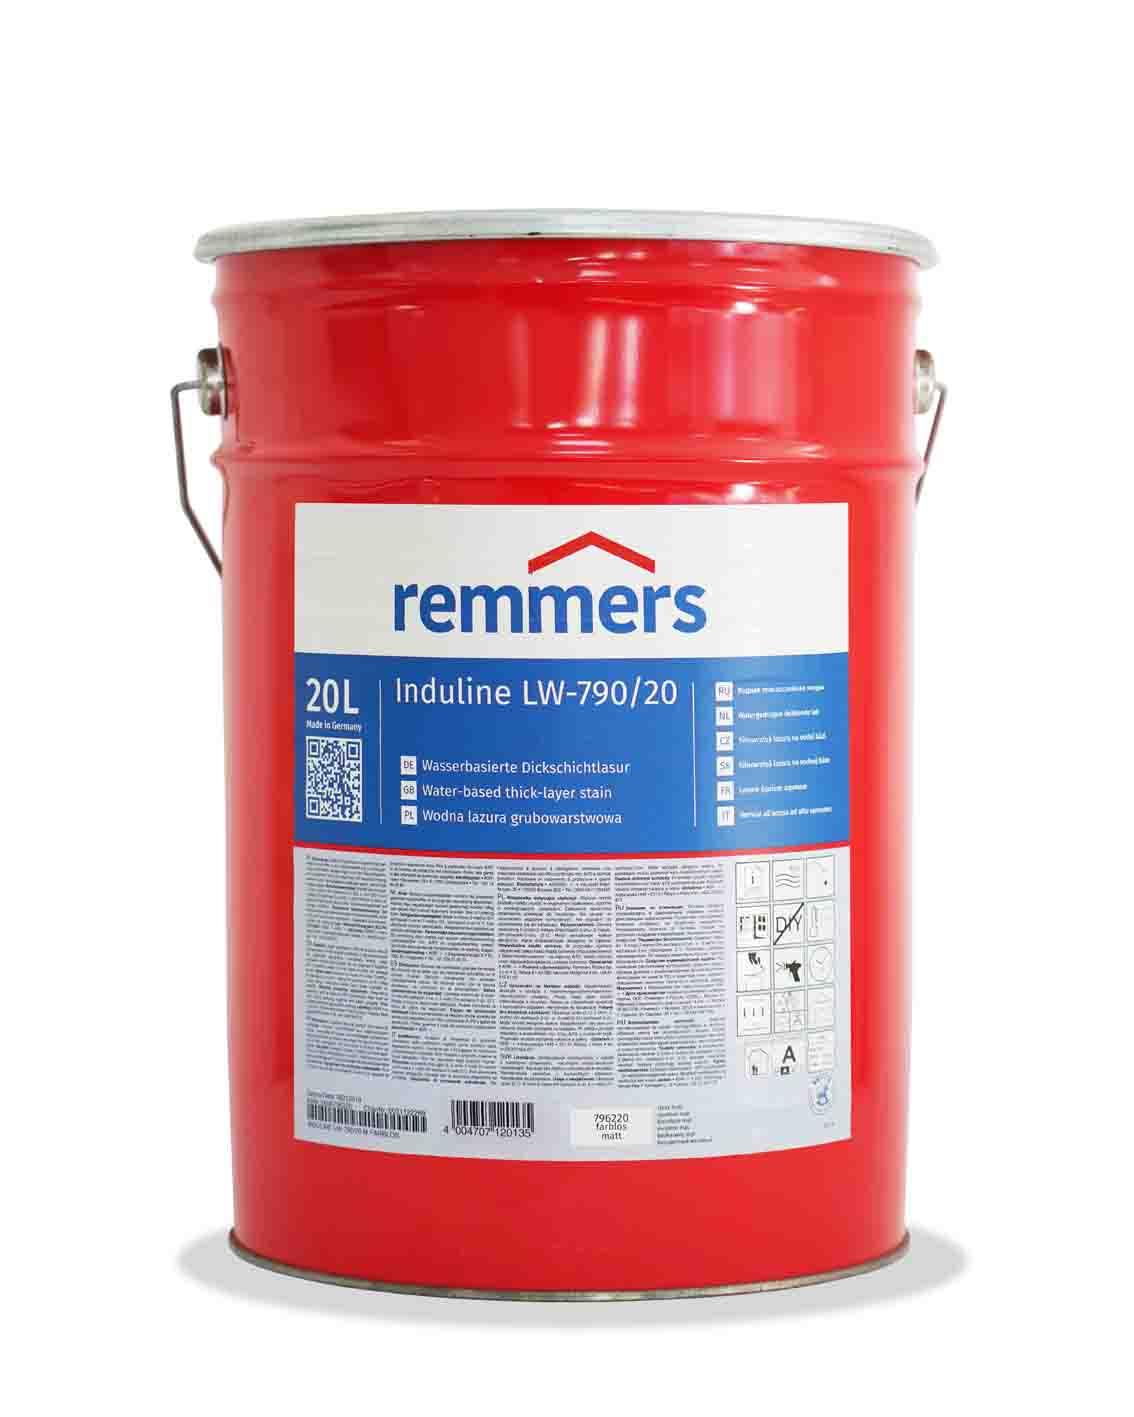 remmers-Induline LW-790 姘存�ч�㈡�